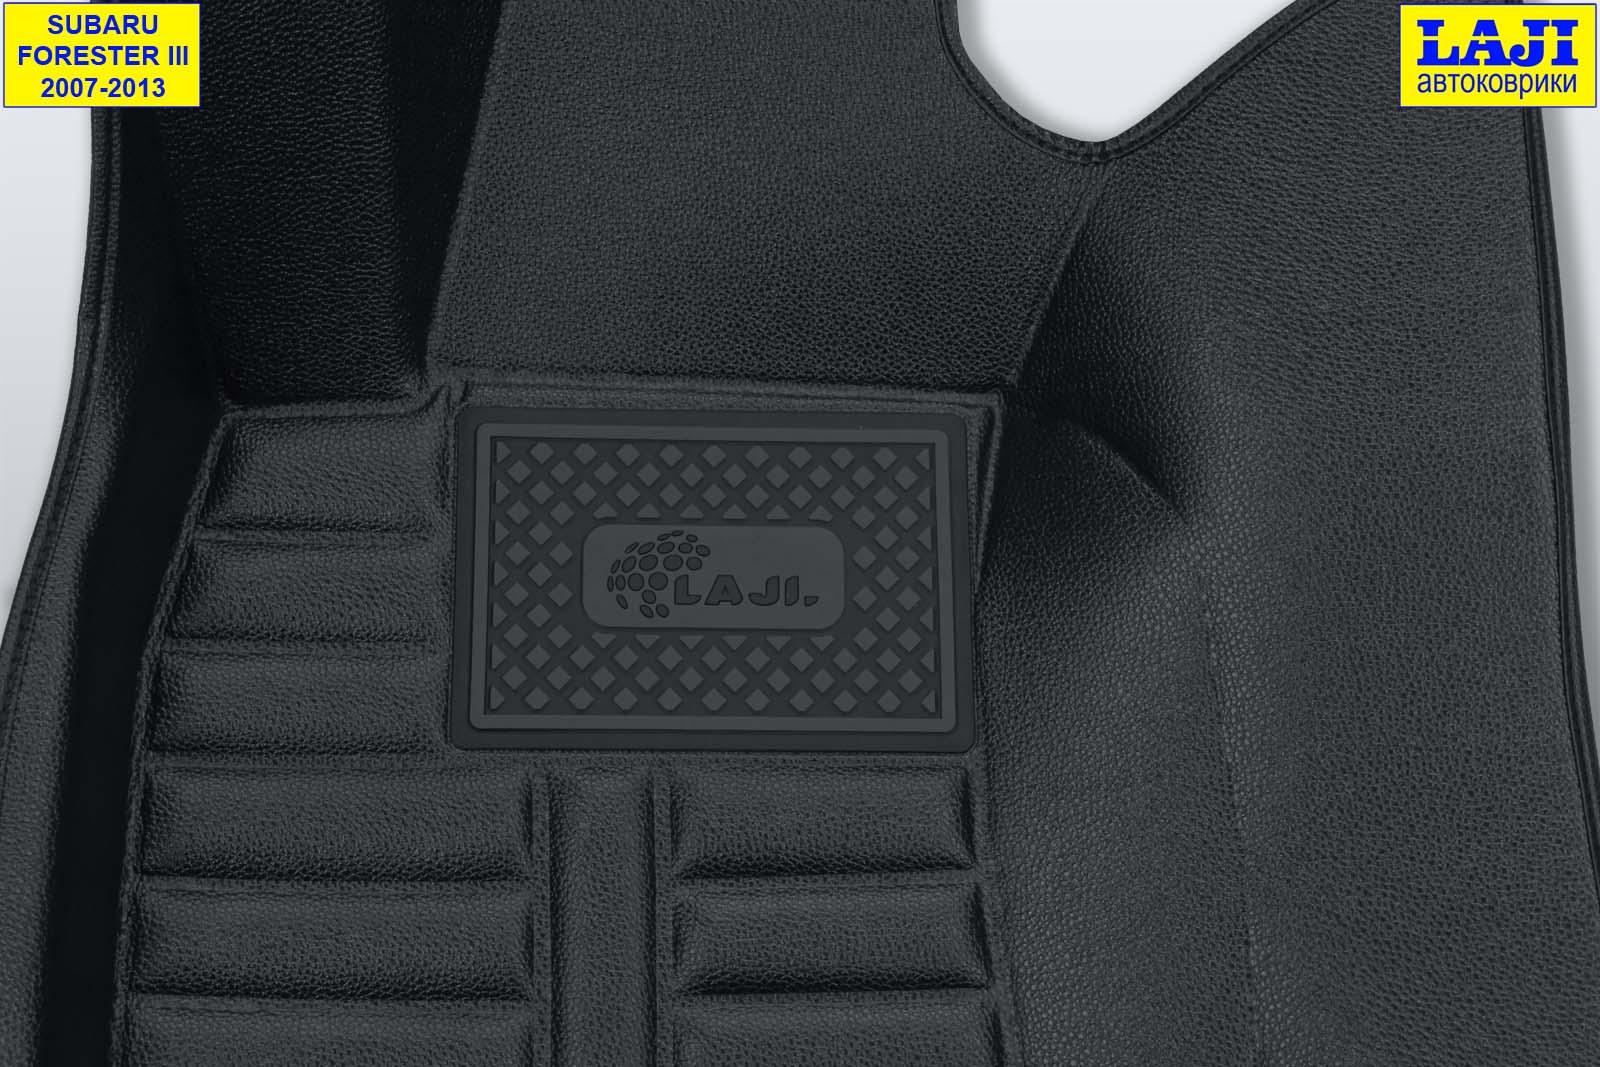 5D коврики в салон Subaru Forester III 2007-2013 7